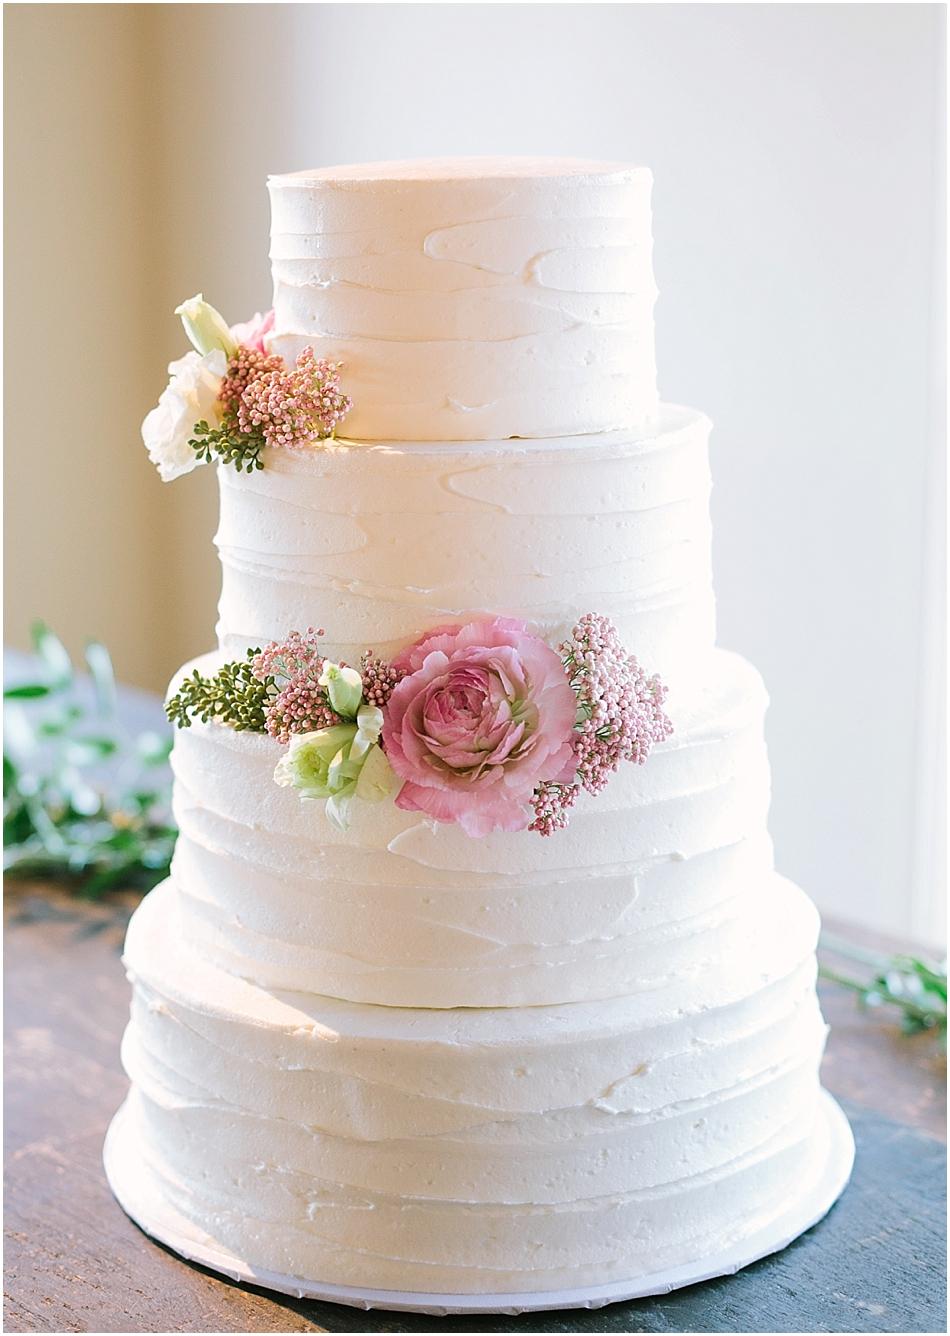 Central Texas Wedding | Fine Art | Vineyards at Chappel Lodge | Spring Wedding | Austin-15.jpg